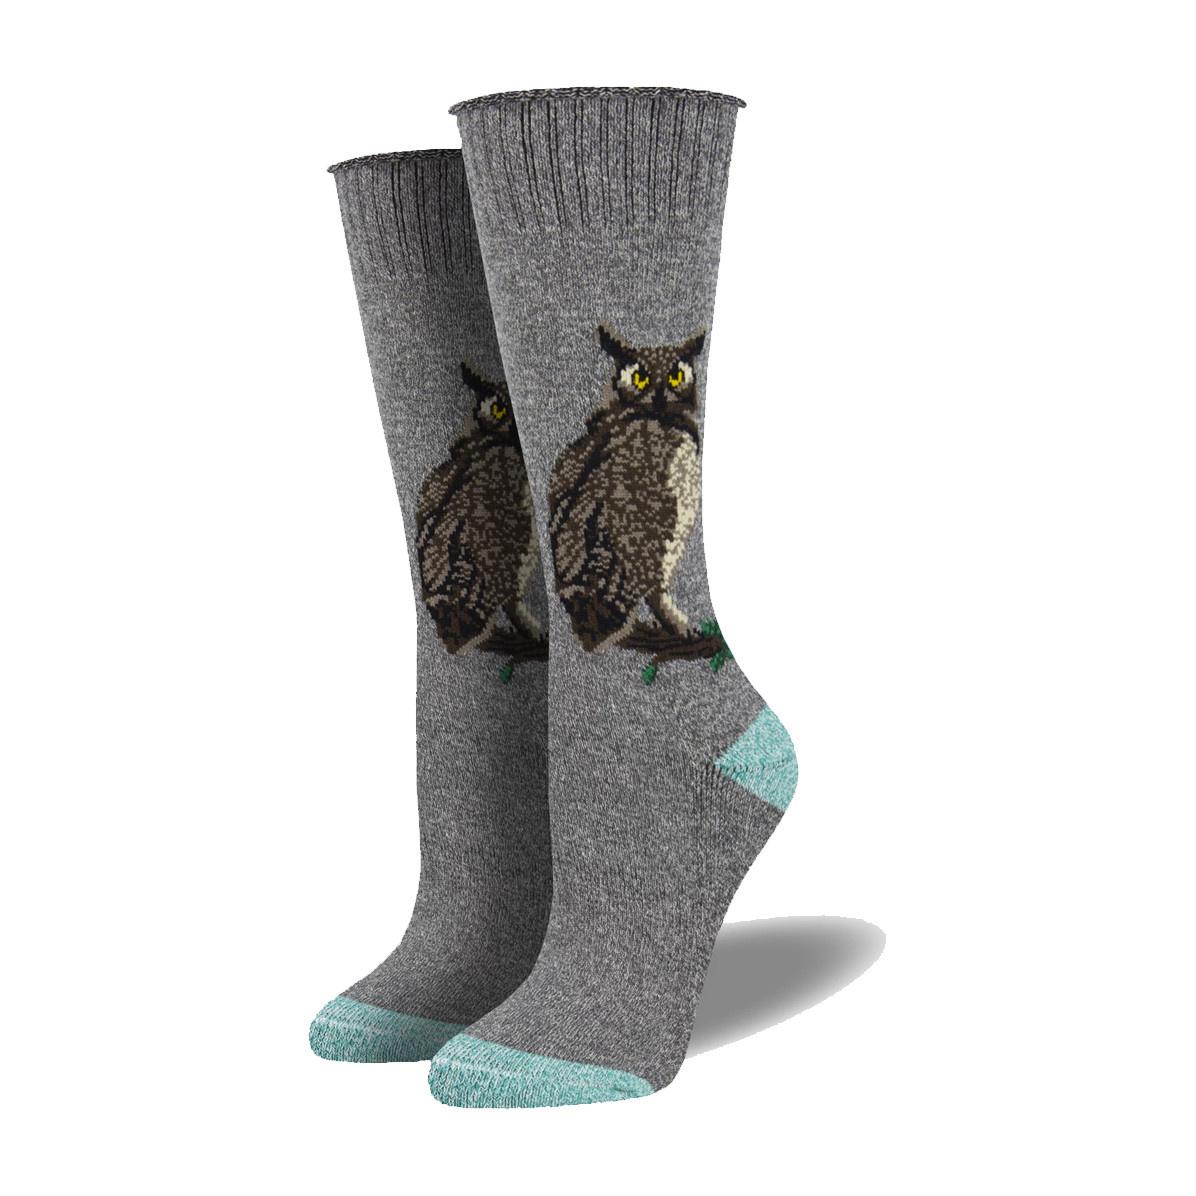 Socksmith Socksmith Women's Boot Socks Wise Guy Grey